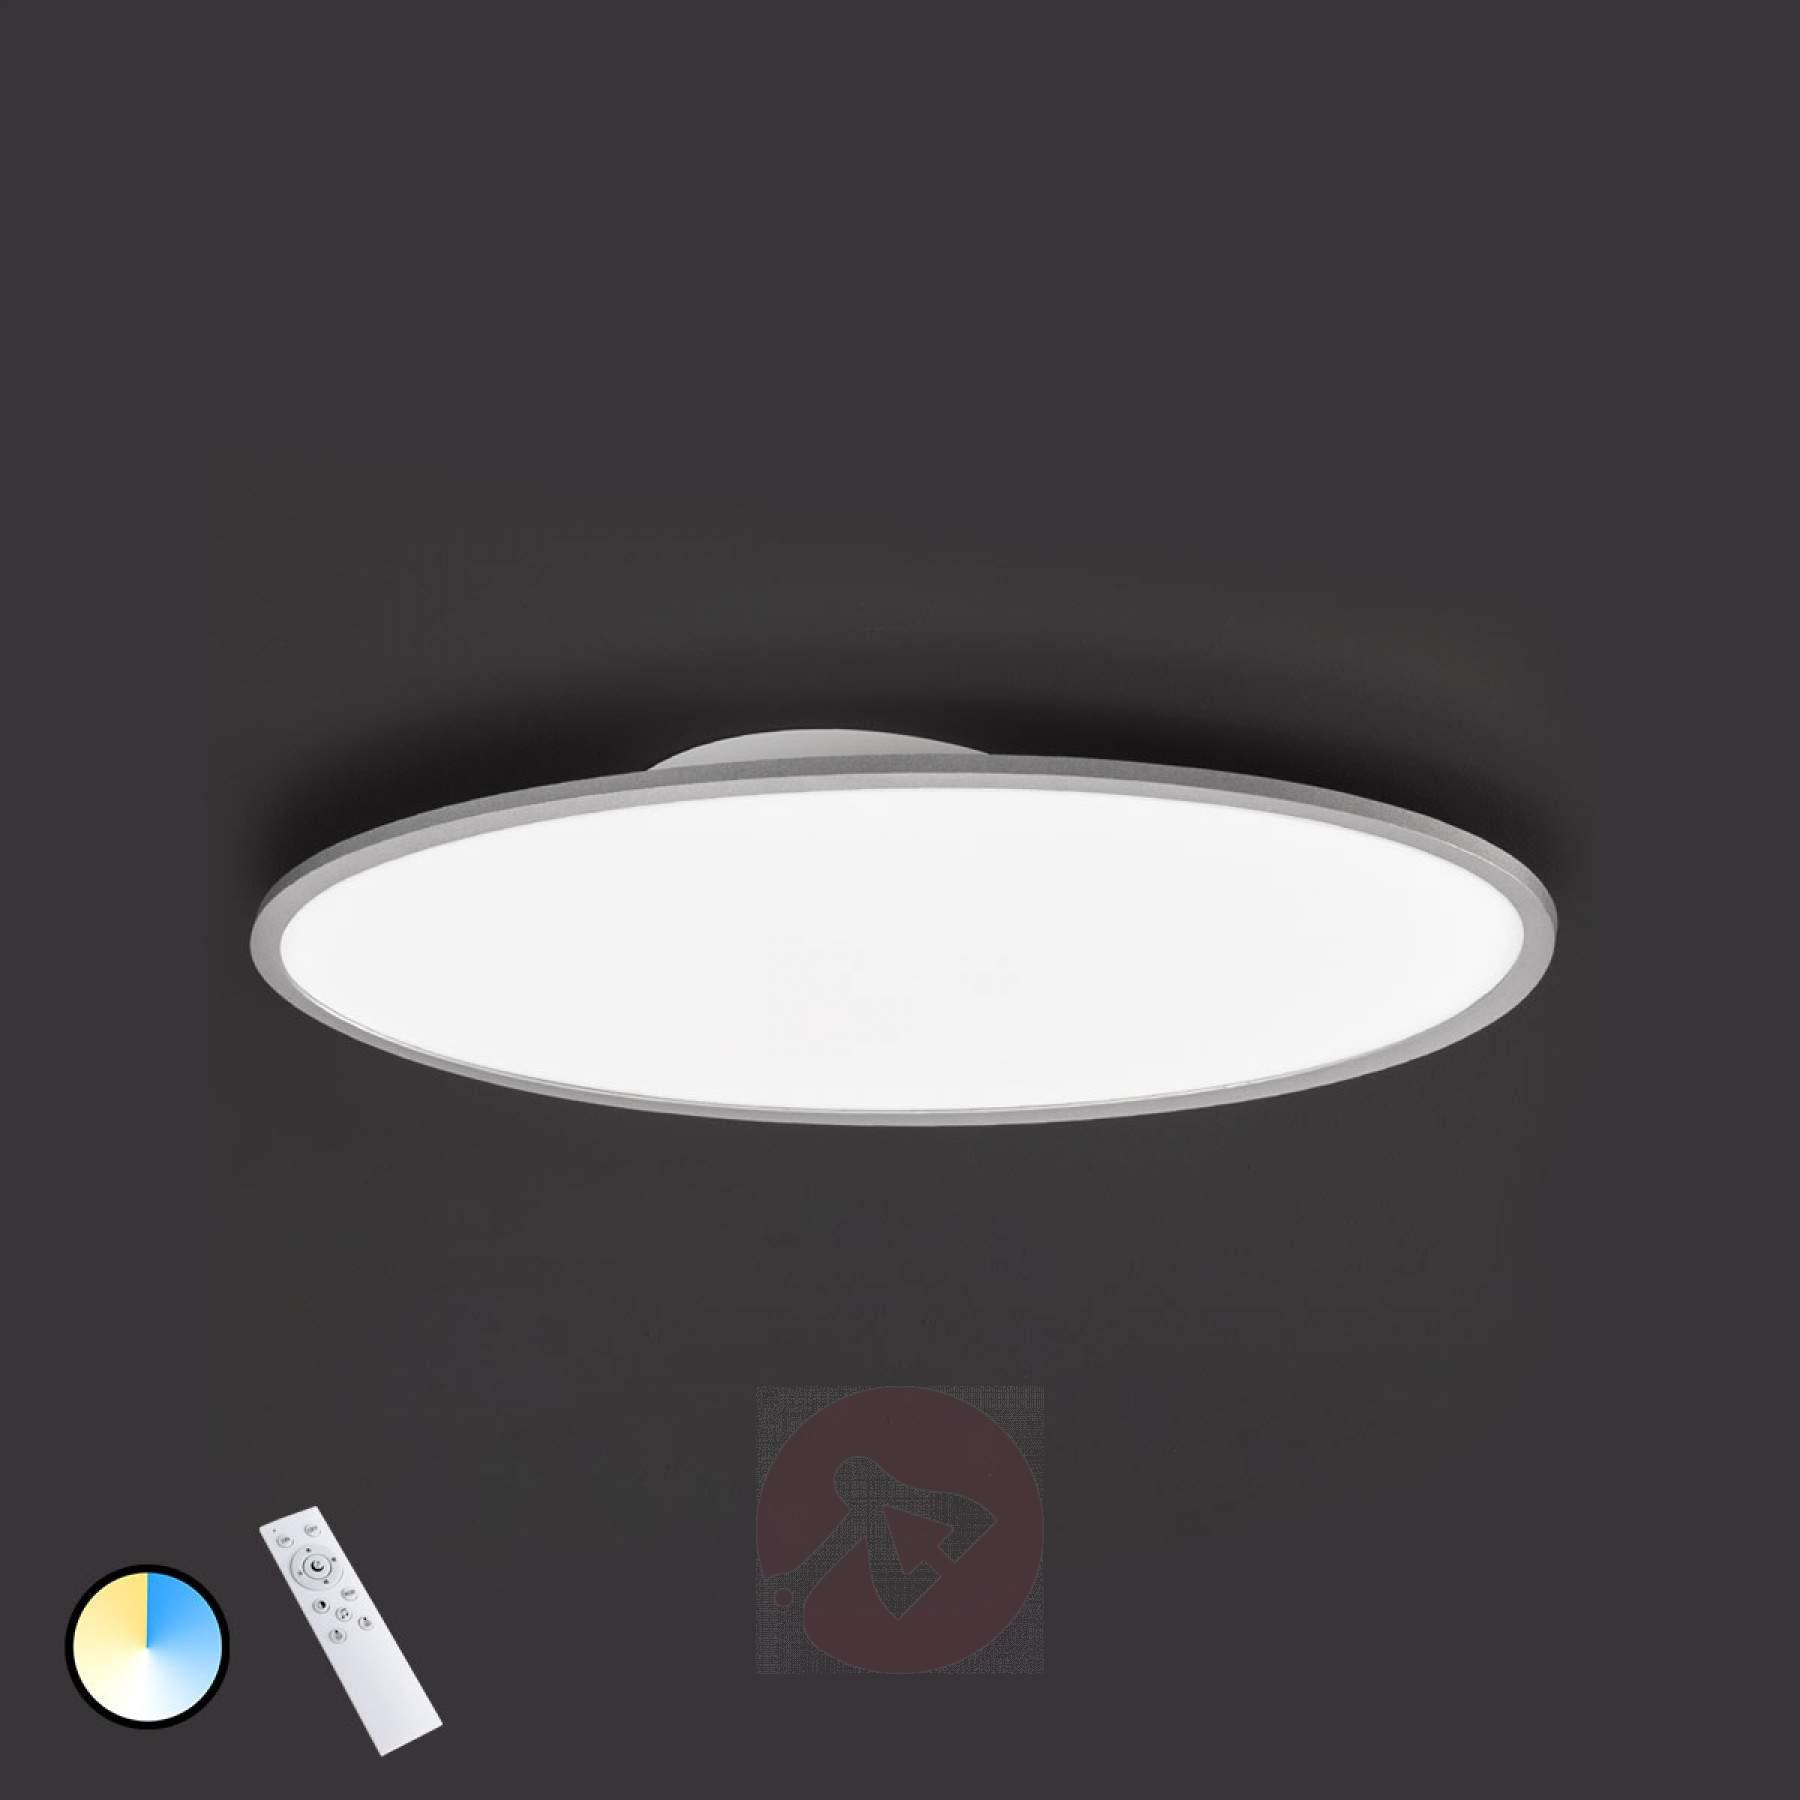 Full Size of Deckenlampe Led Dimmbar Valley Dimmbare Deckenleuchte Kaufen Lampenweltde Beleuchtung Küche Sofa Grau Leder Deckenlampen Für Wohnzimmer Einbauleuchten Bad Wohnzimmer Deckenlampe Led Dimmbar